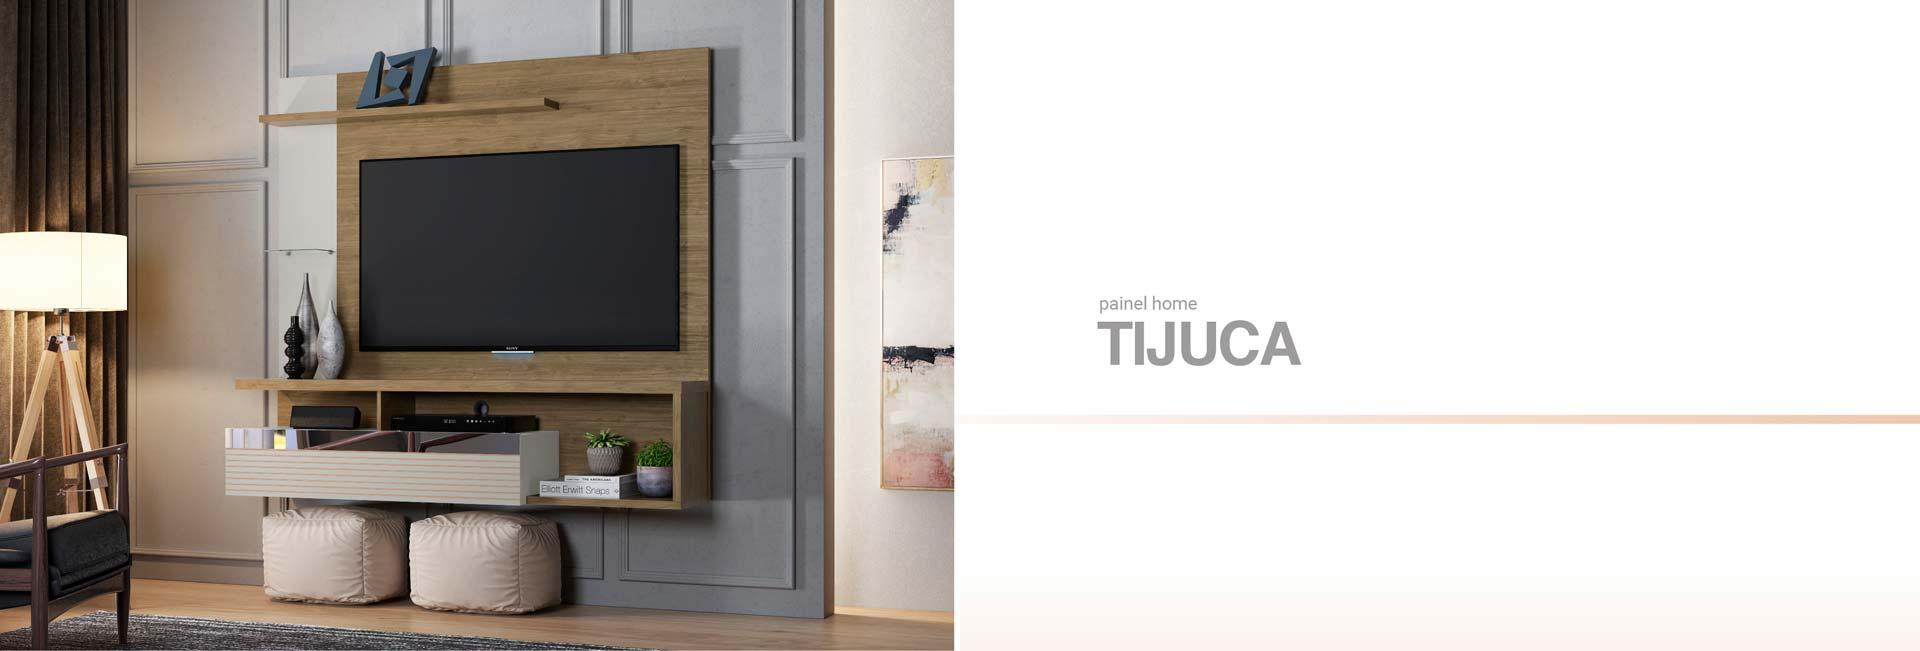 Painel para TV  Tijuca